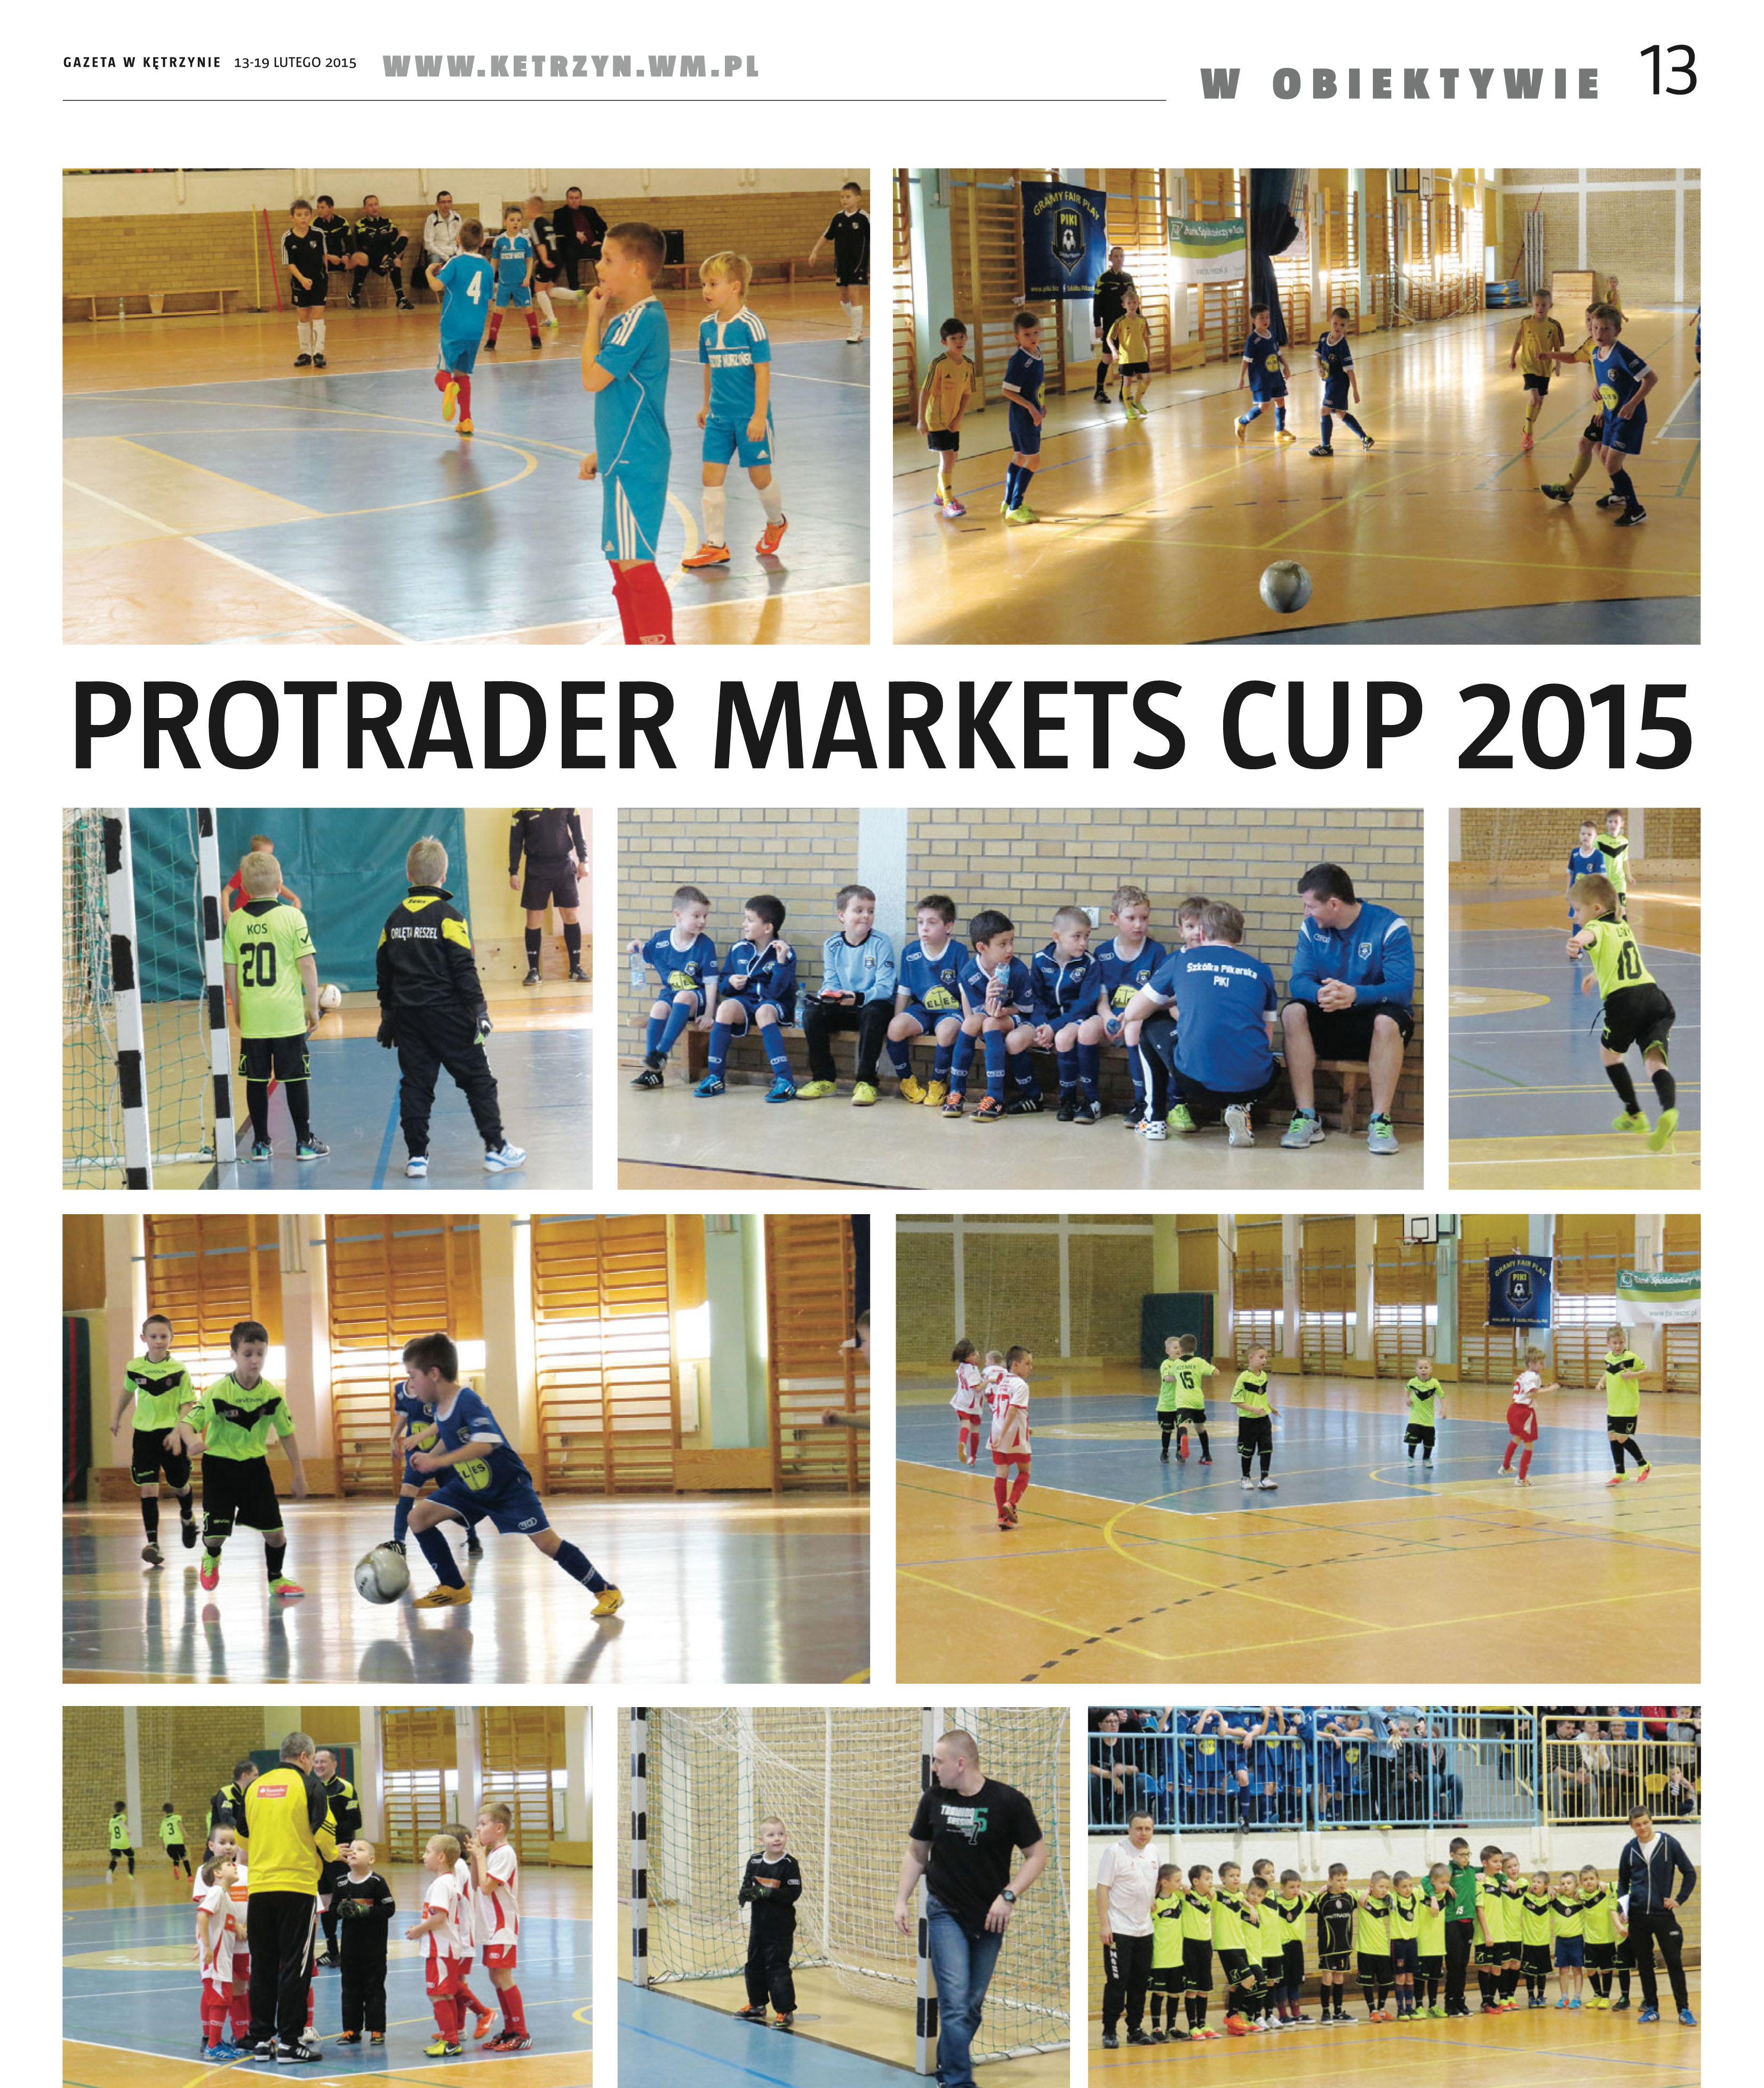 2015.02.13 - Protrader Masters Cup 2015 - e-gazeta www.ketrzyn.wm